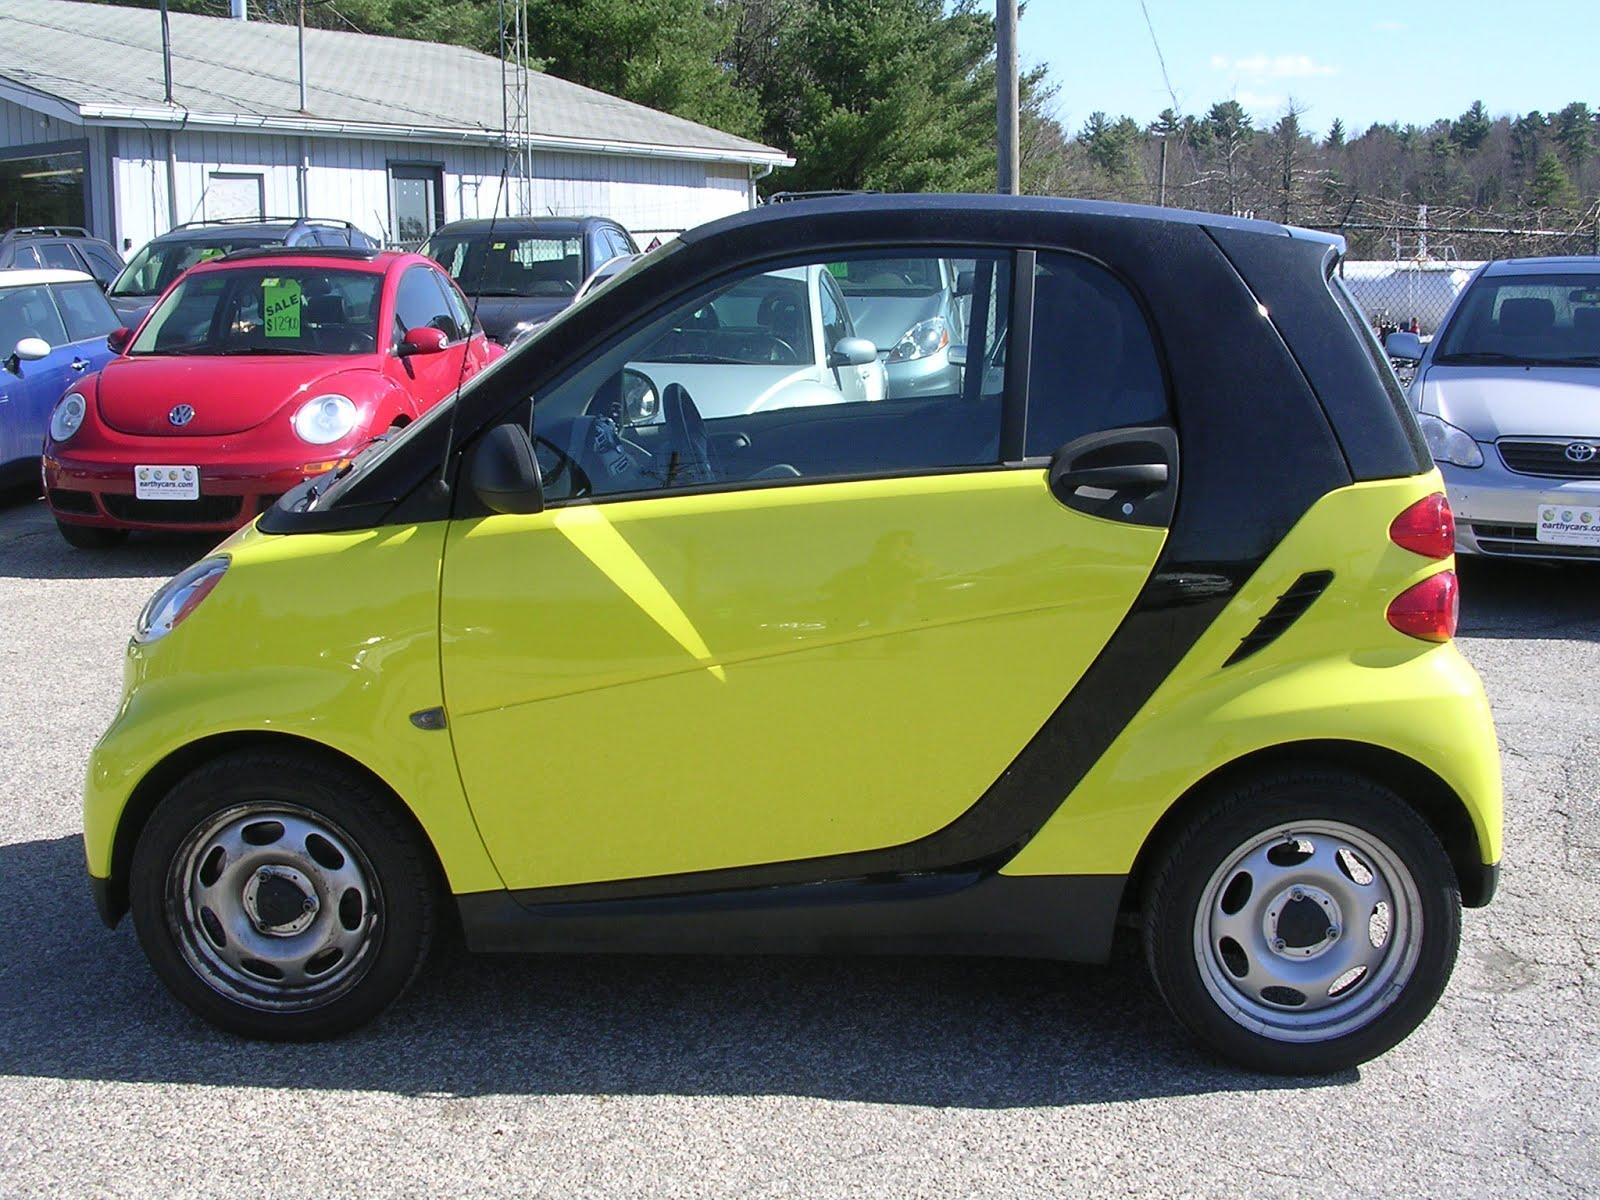 Earthy cars blog october 2012 for Honda smart car